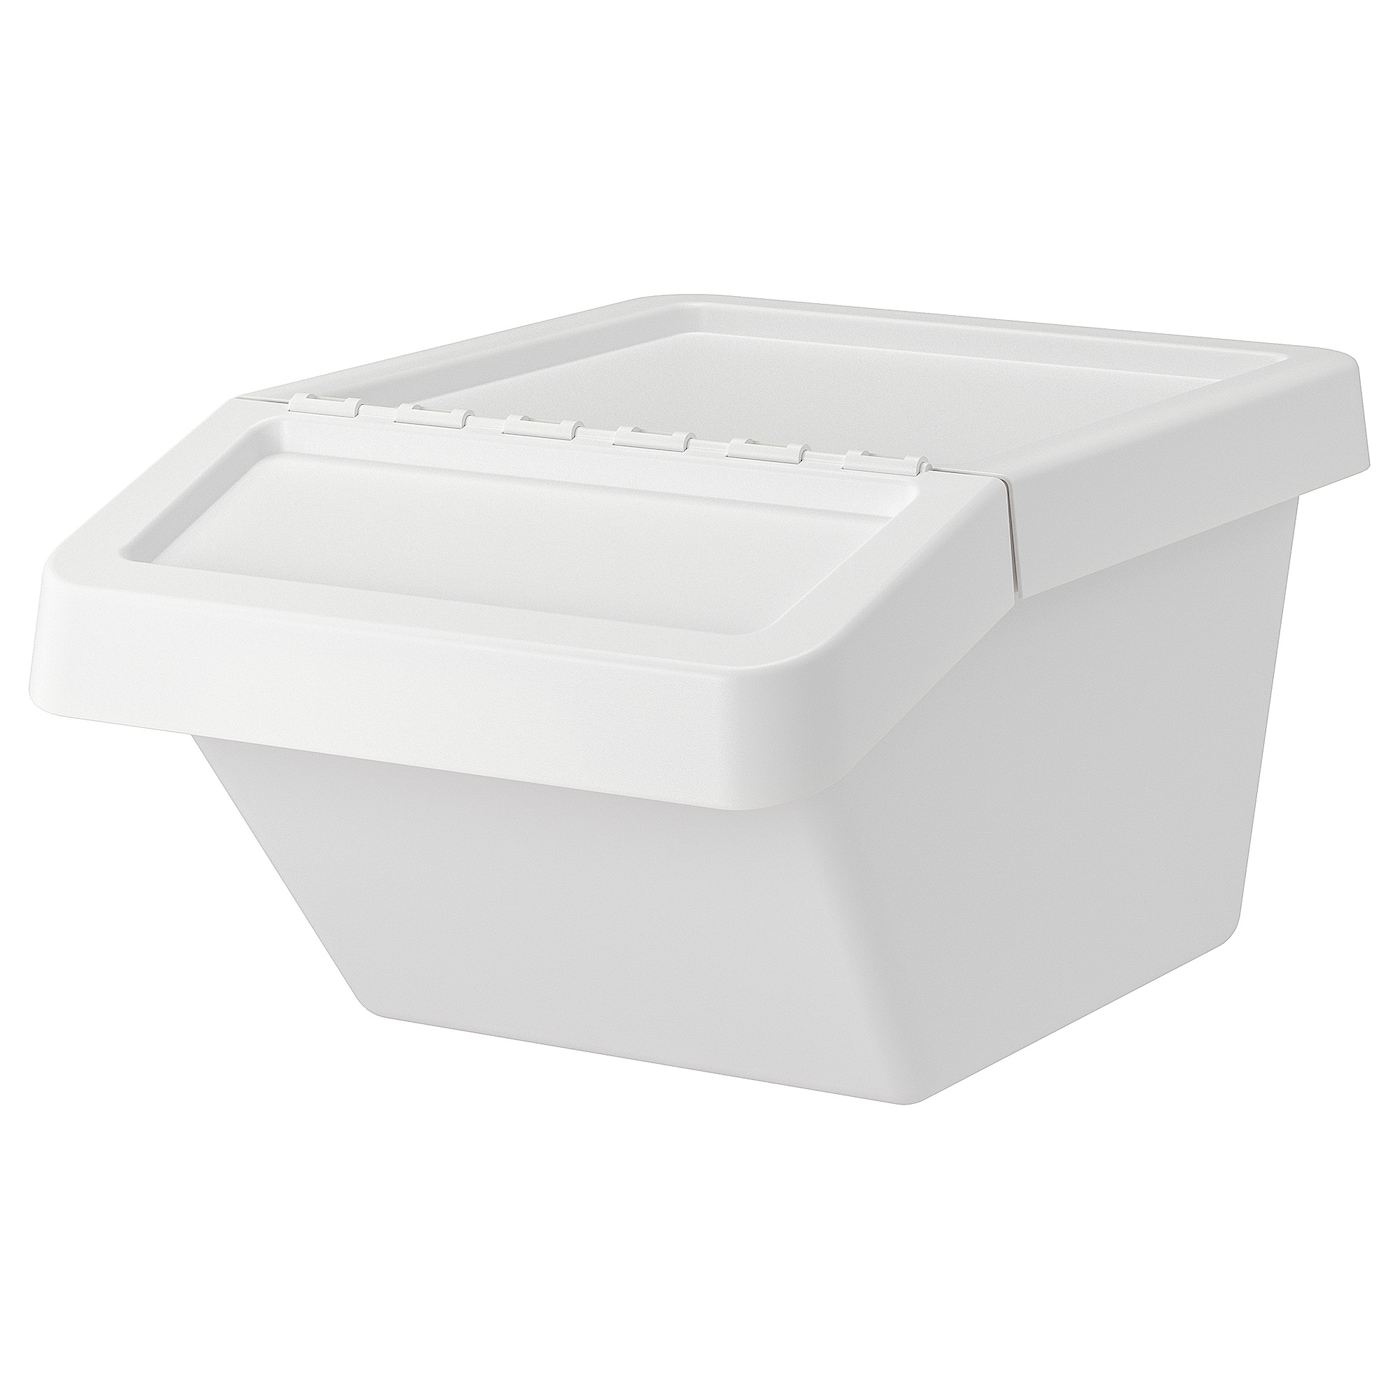 Ikea SORTERA Waste sorting bin with lid, white10 gallon (37 l)